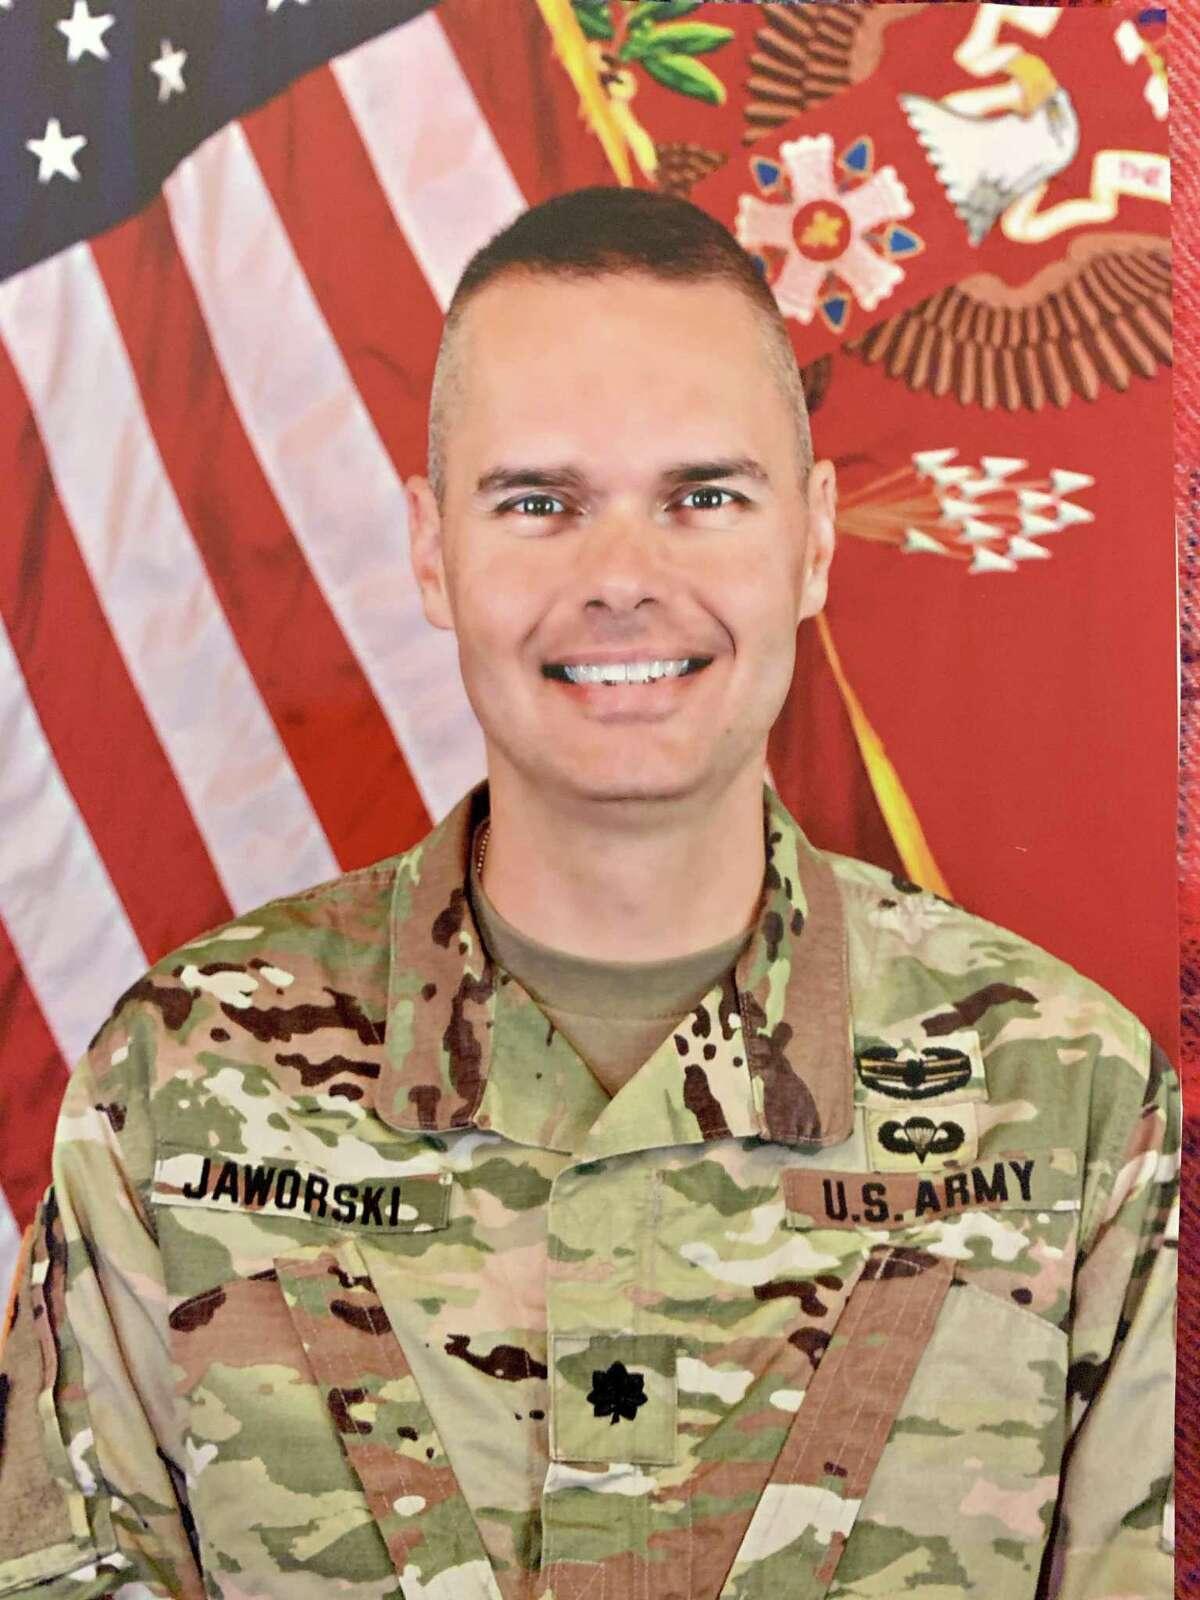 Lt. Col. Charles K. Jaworski